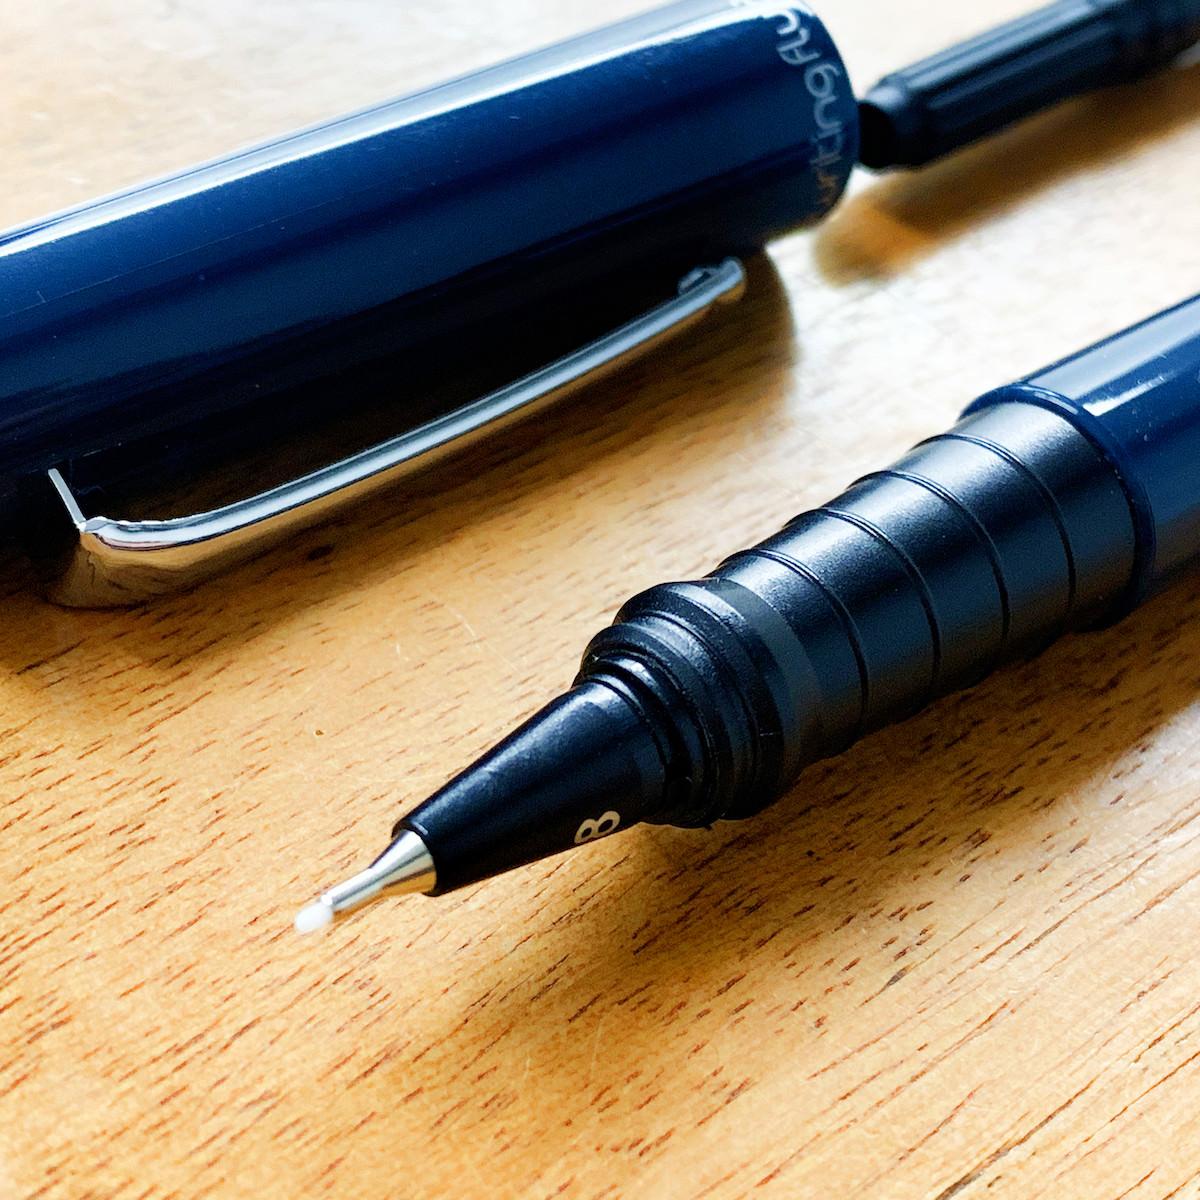 felt-pen-fluidwriting_6